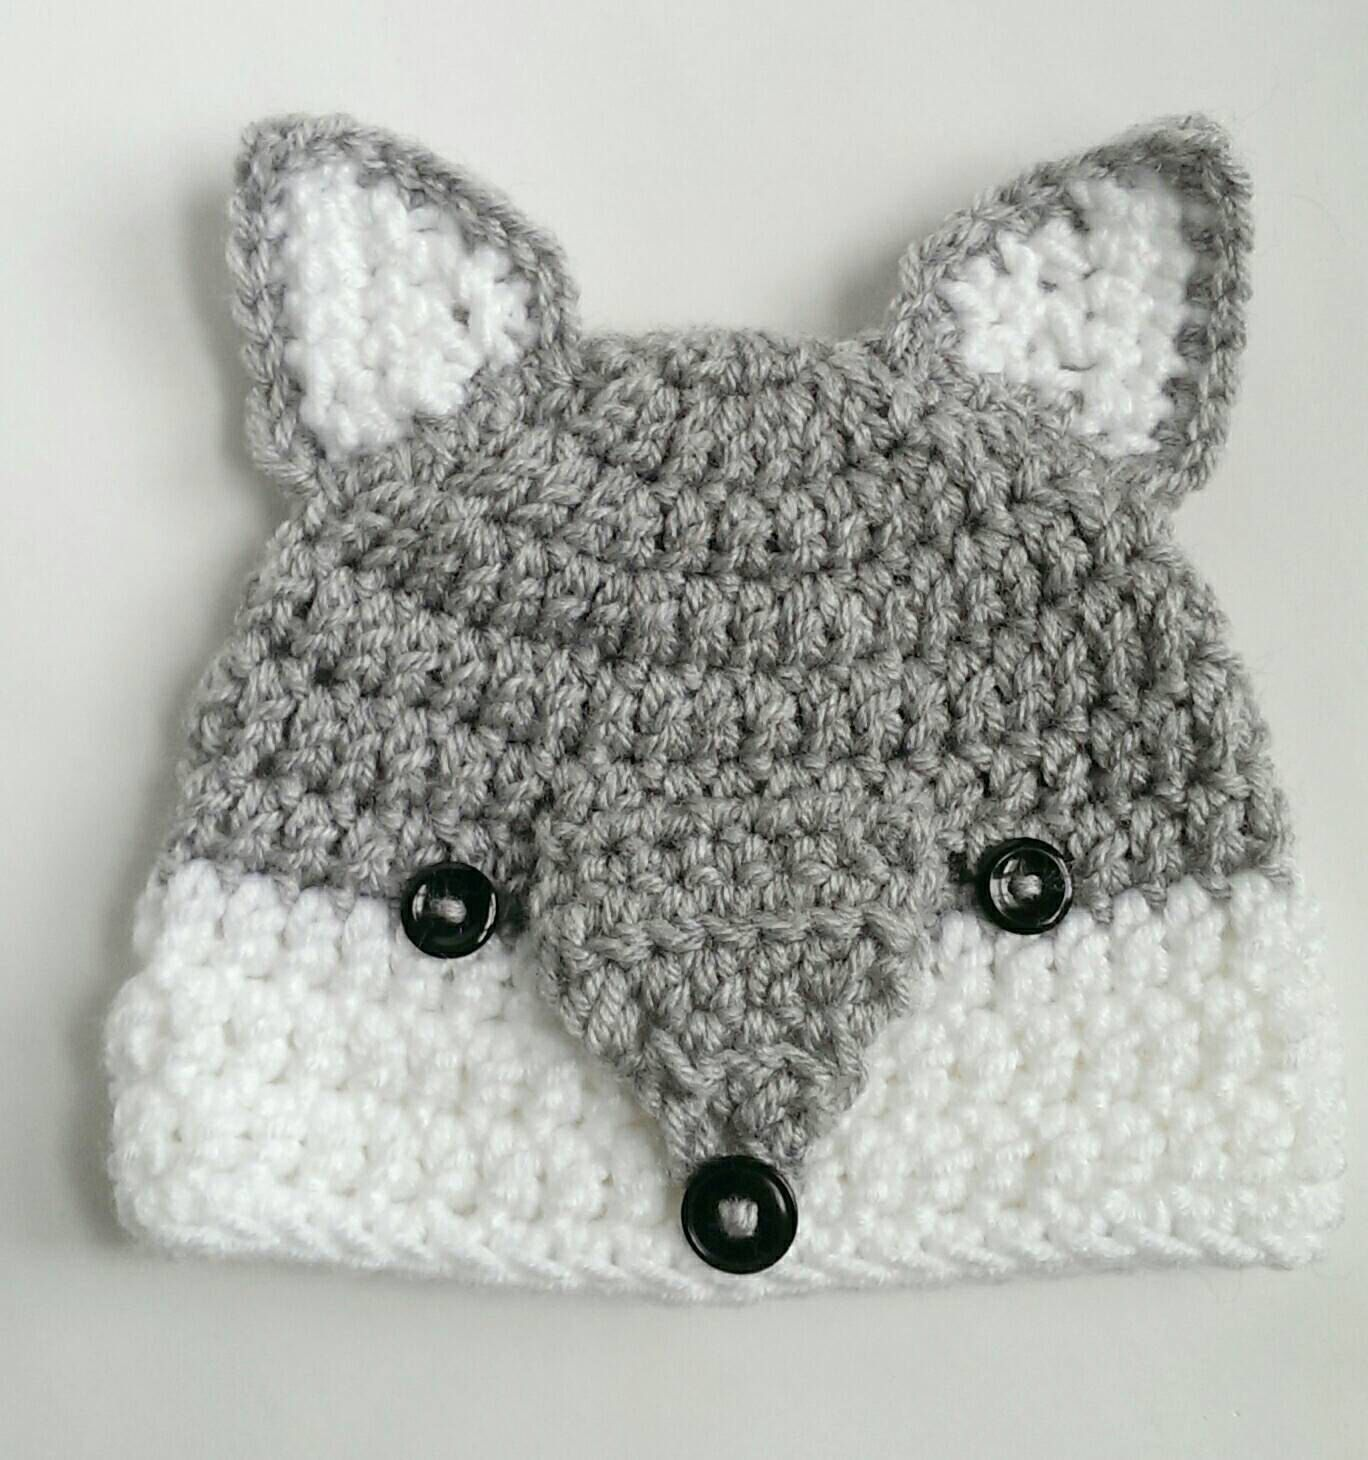 Wolf Hat Woodlands Animal Handmade Crochet Knit Hat Beanie Etsy Crochet Animal Hats Crochet Baby Hats Crochet Wolf